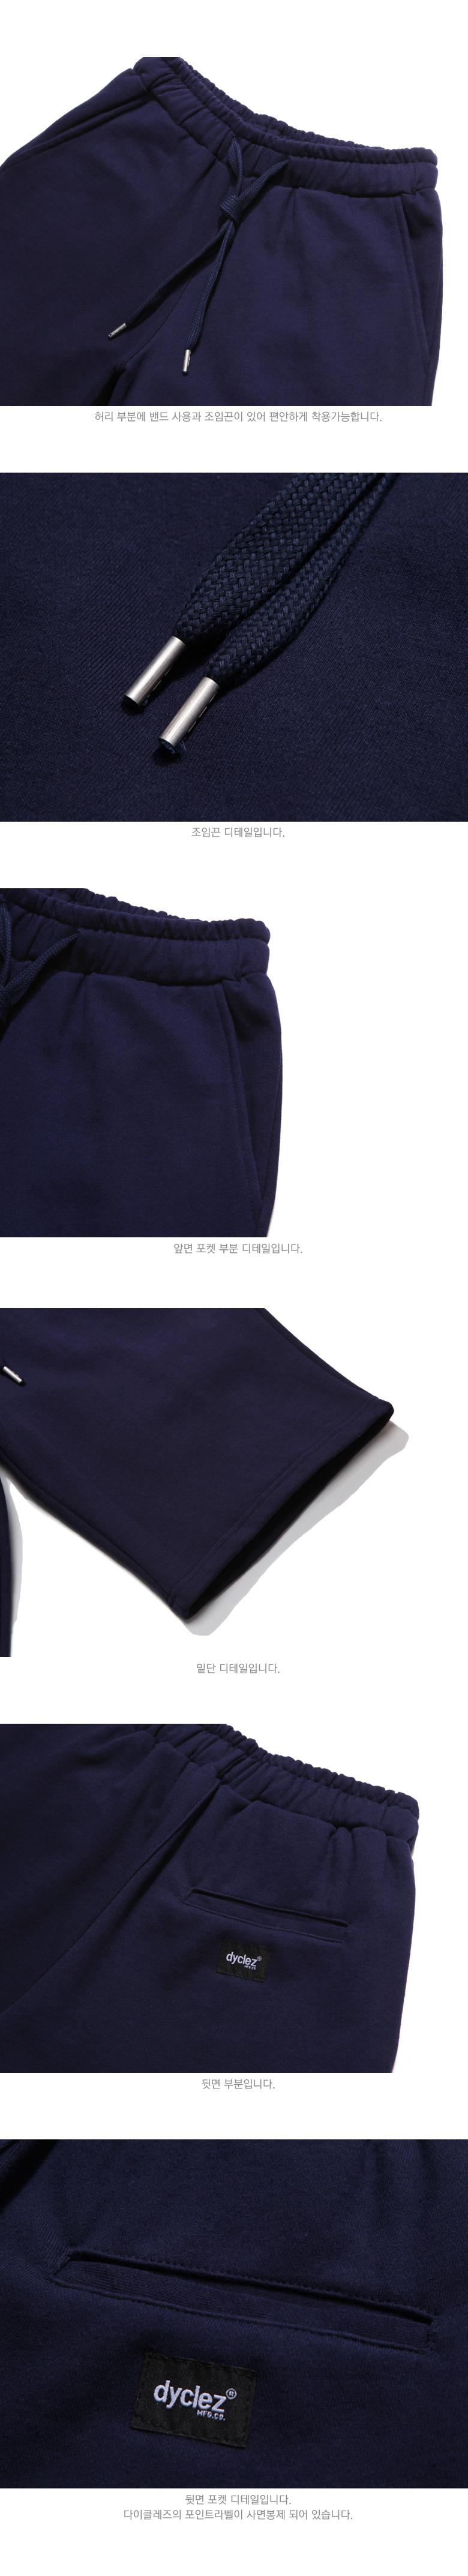 20180615_dy_classicjjuri_short_pants_detail_navy_uk_02.jpg